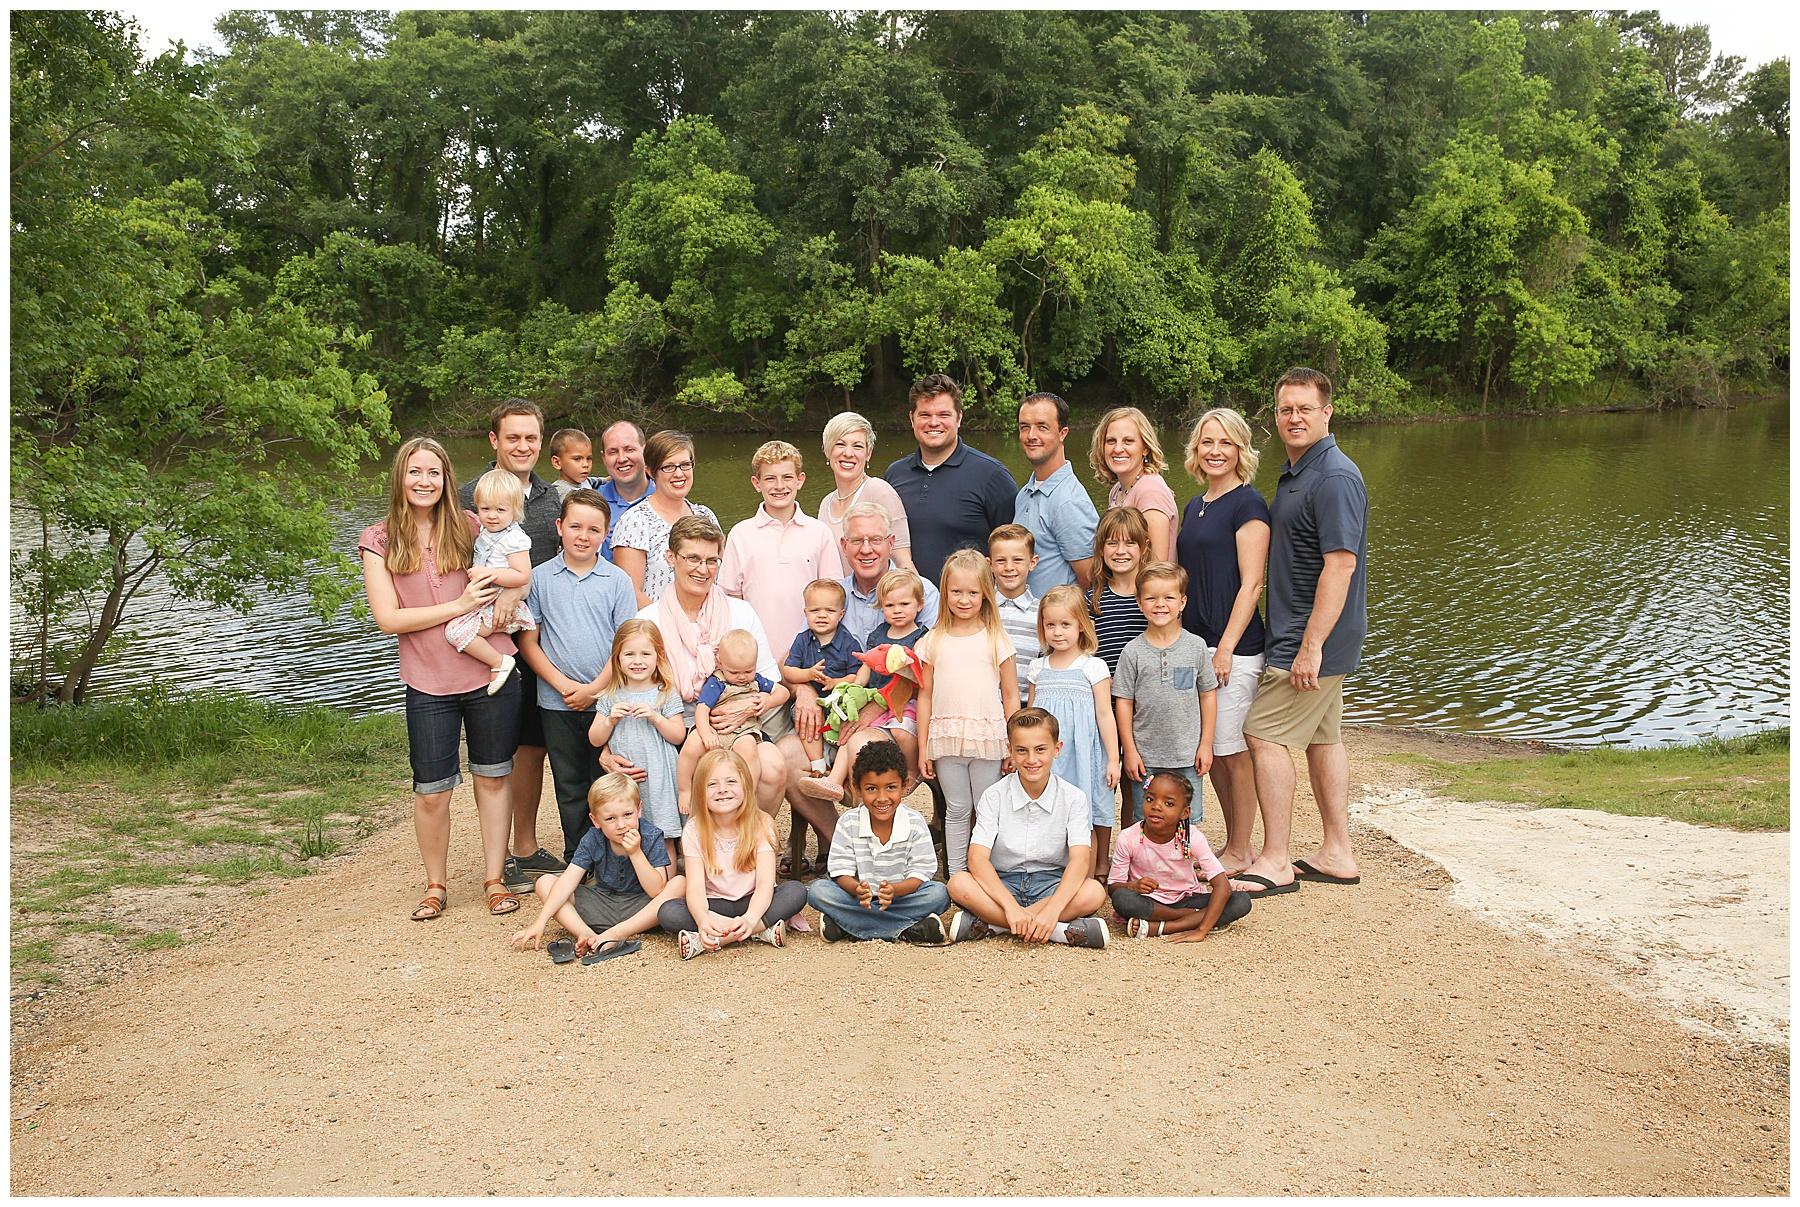 Shurtliff Family Reunion. Spring Family Portraits. Spring, TX